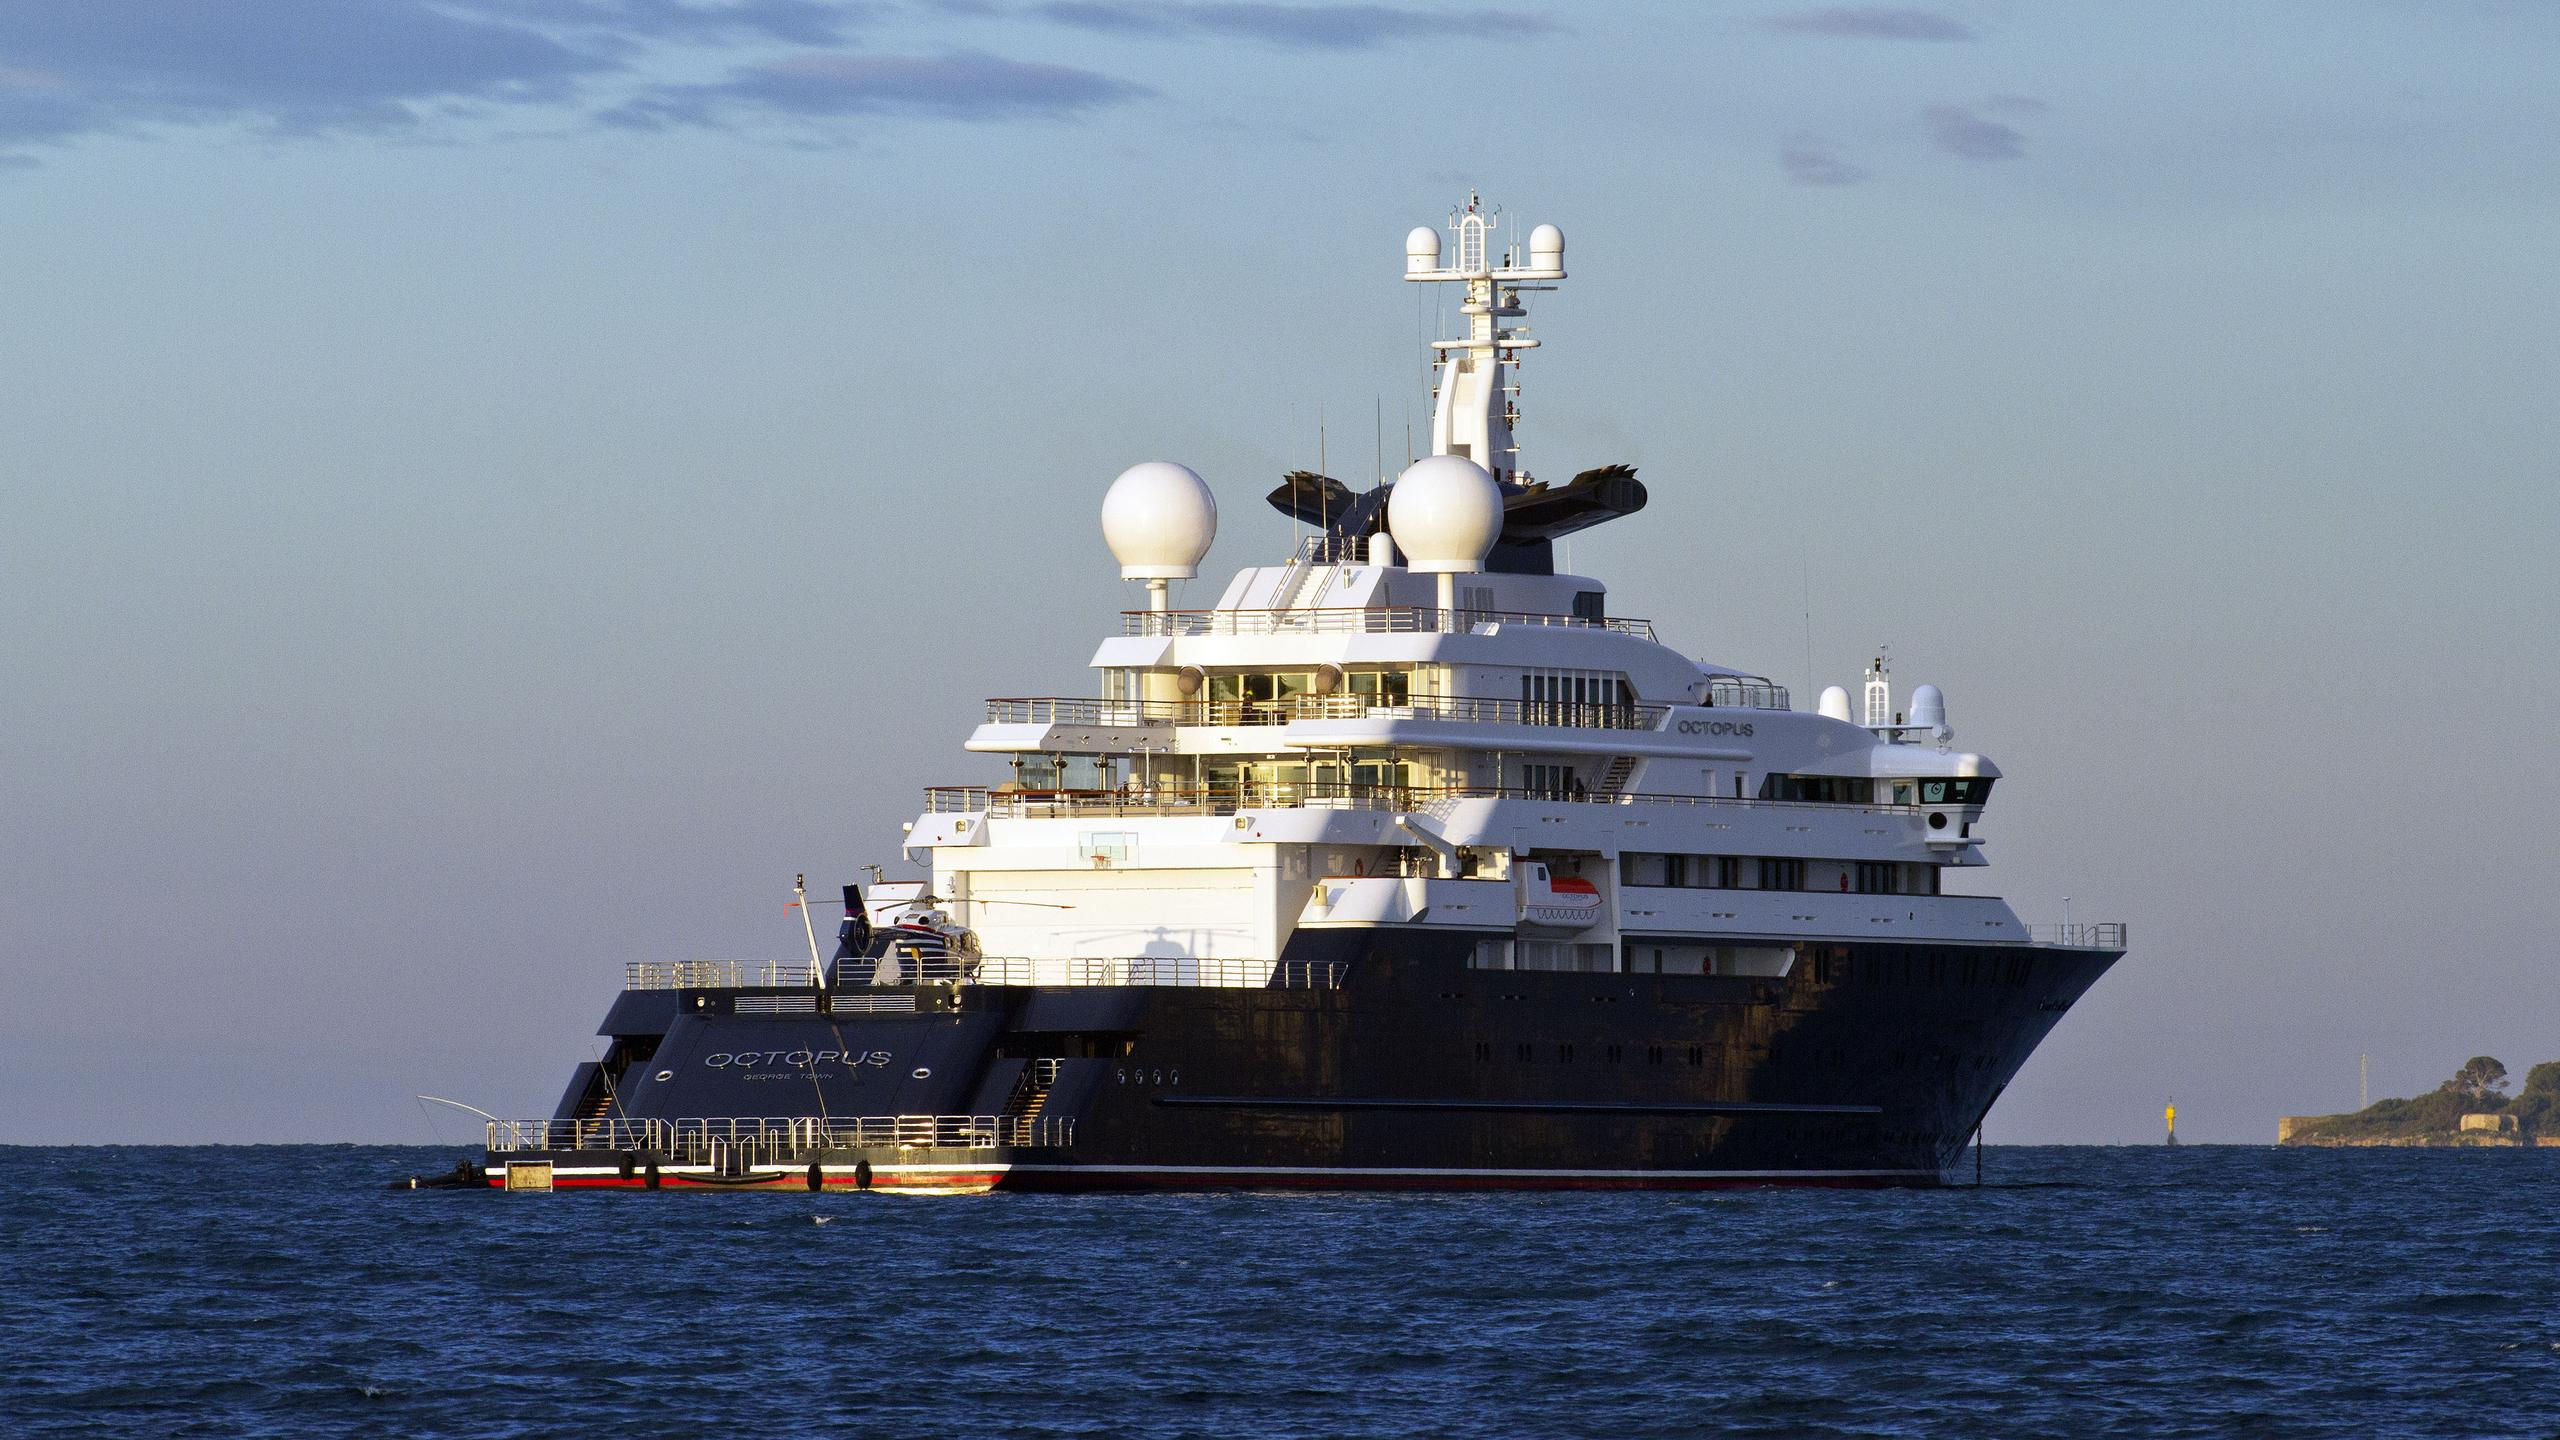 octopus-explorer-yacht-lurssen-2003-126m-stern